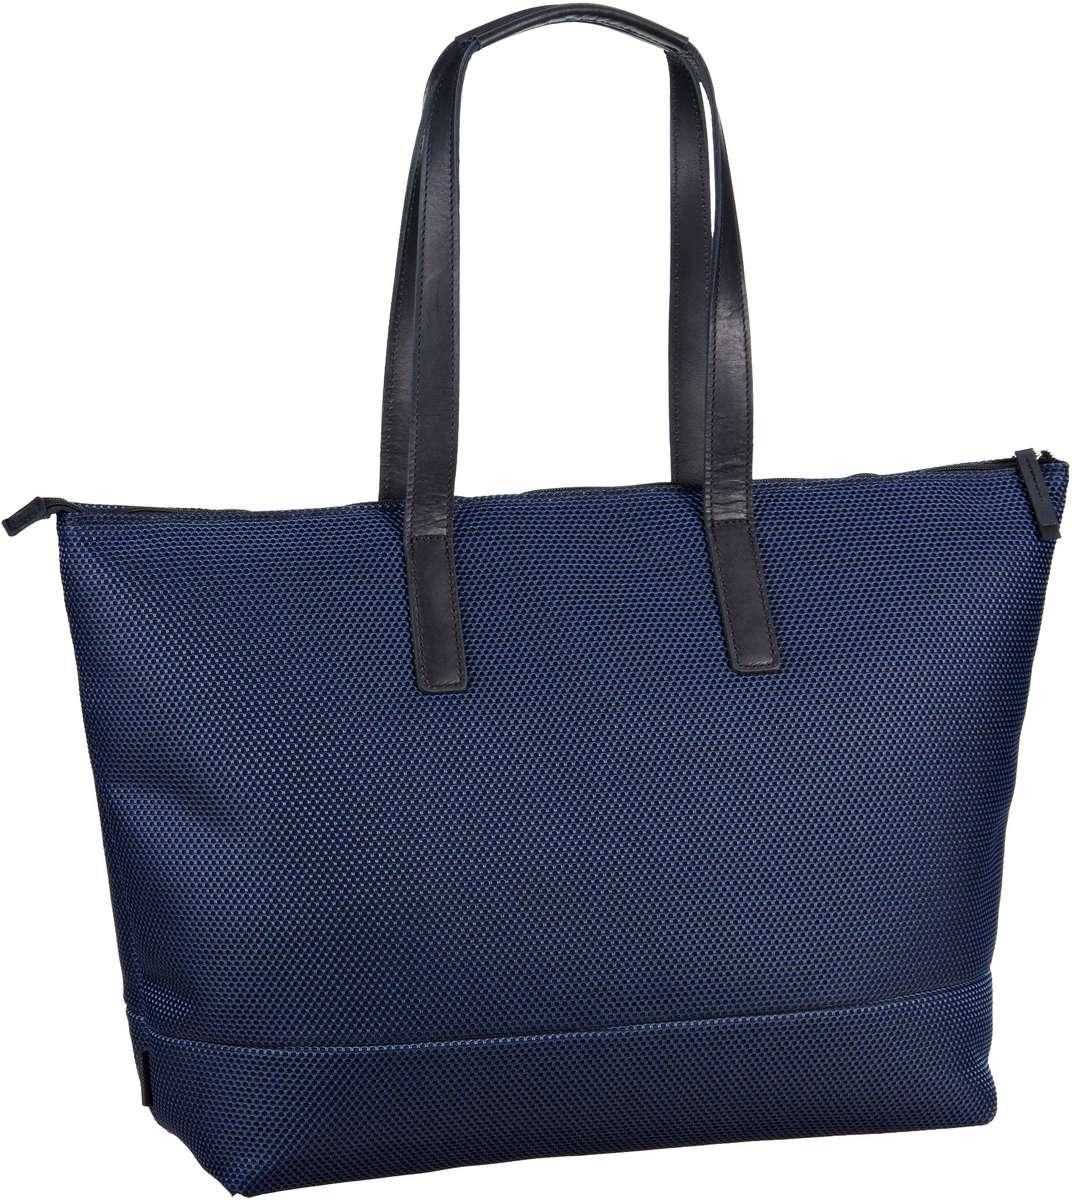 Handtasche Mesh 6183 Shopper Blau